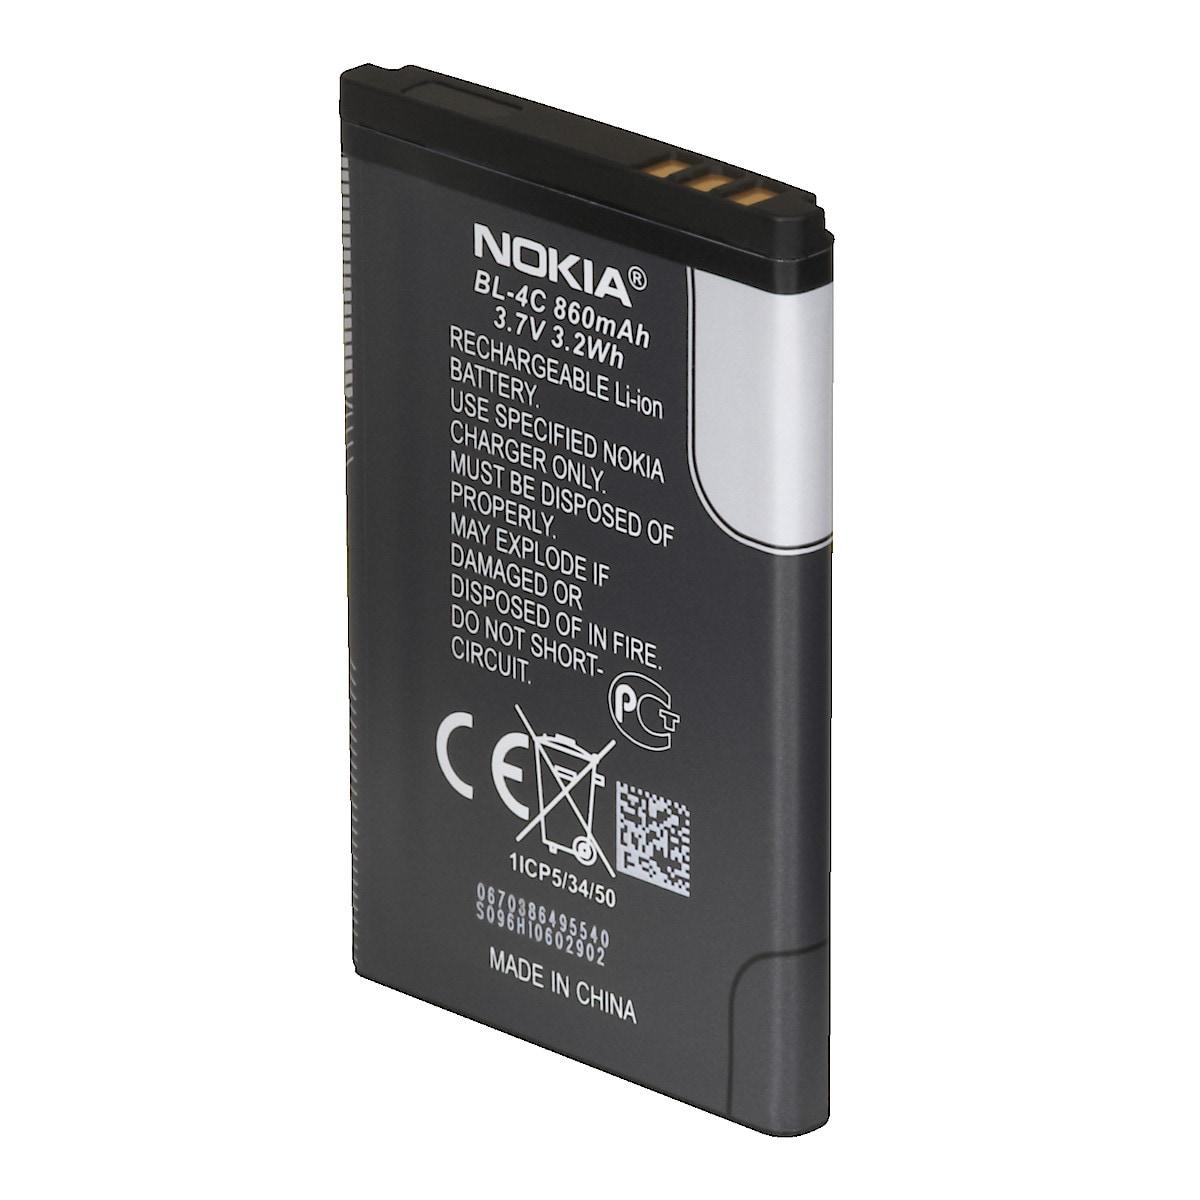 Mobiltelefonbatteri Nokia BL-4C